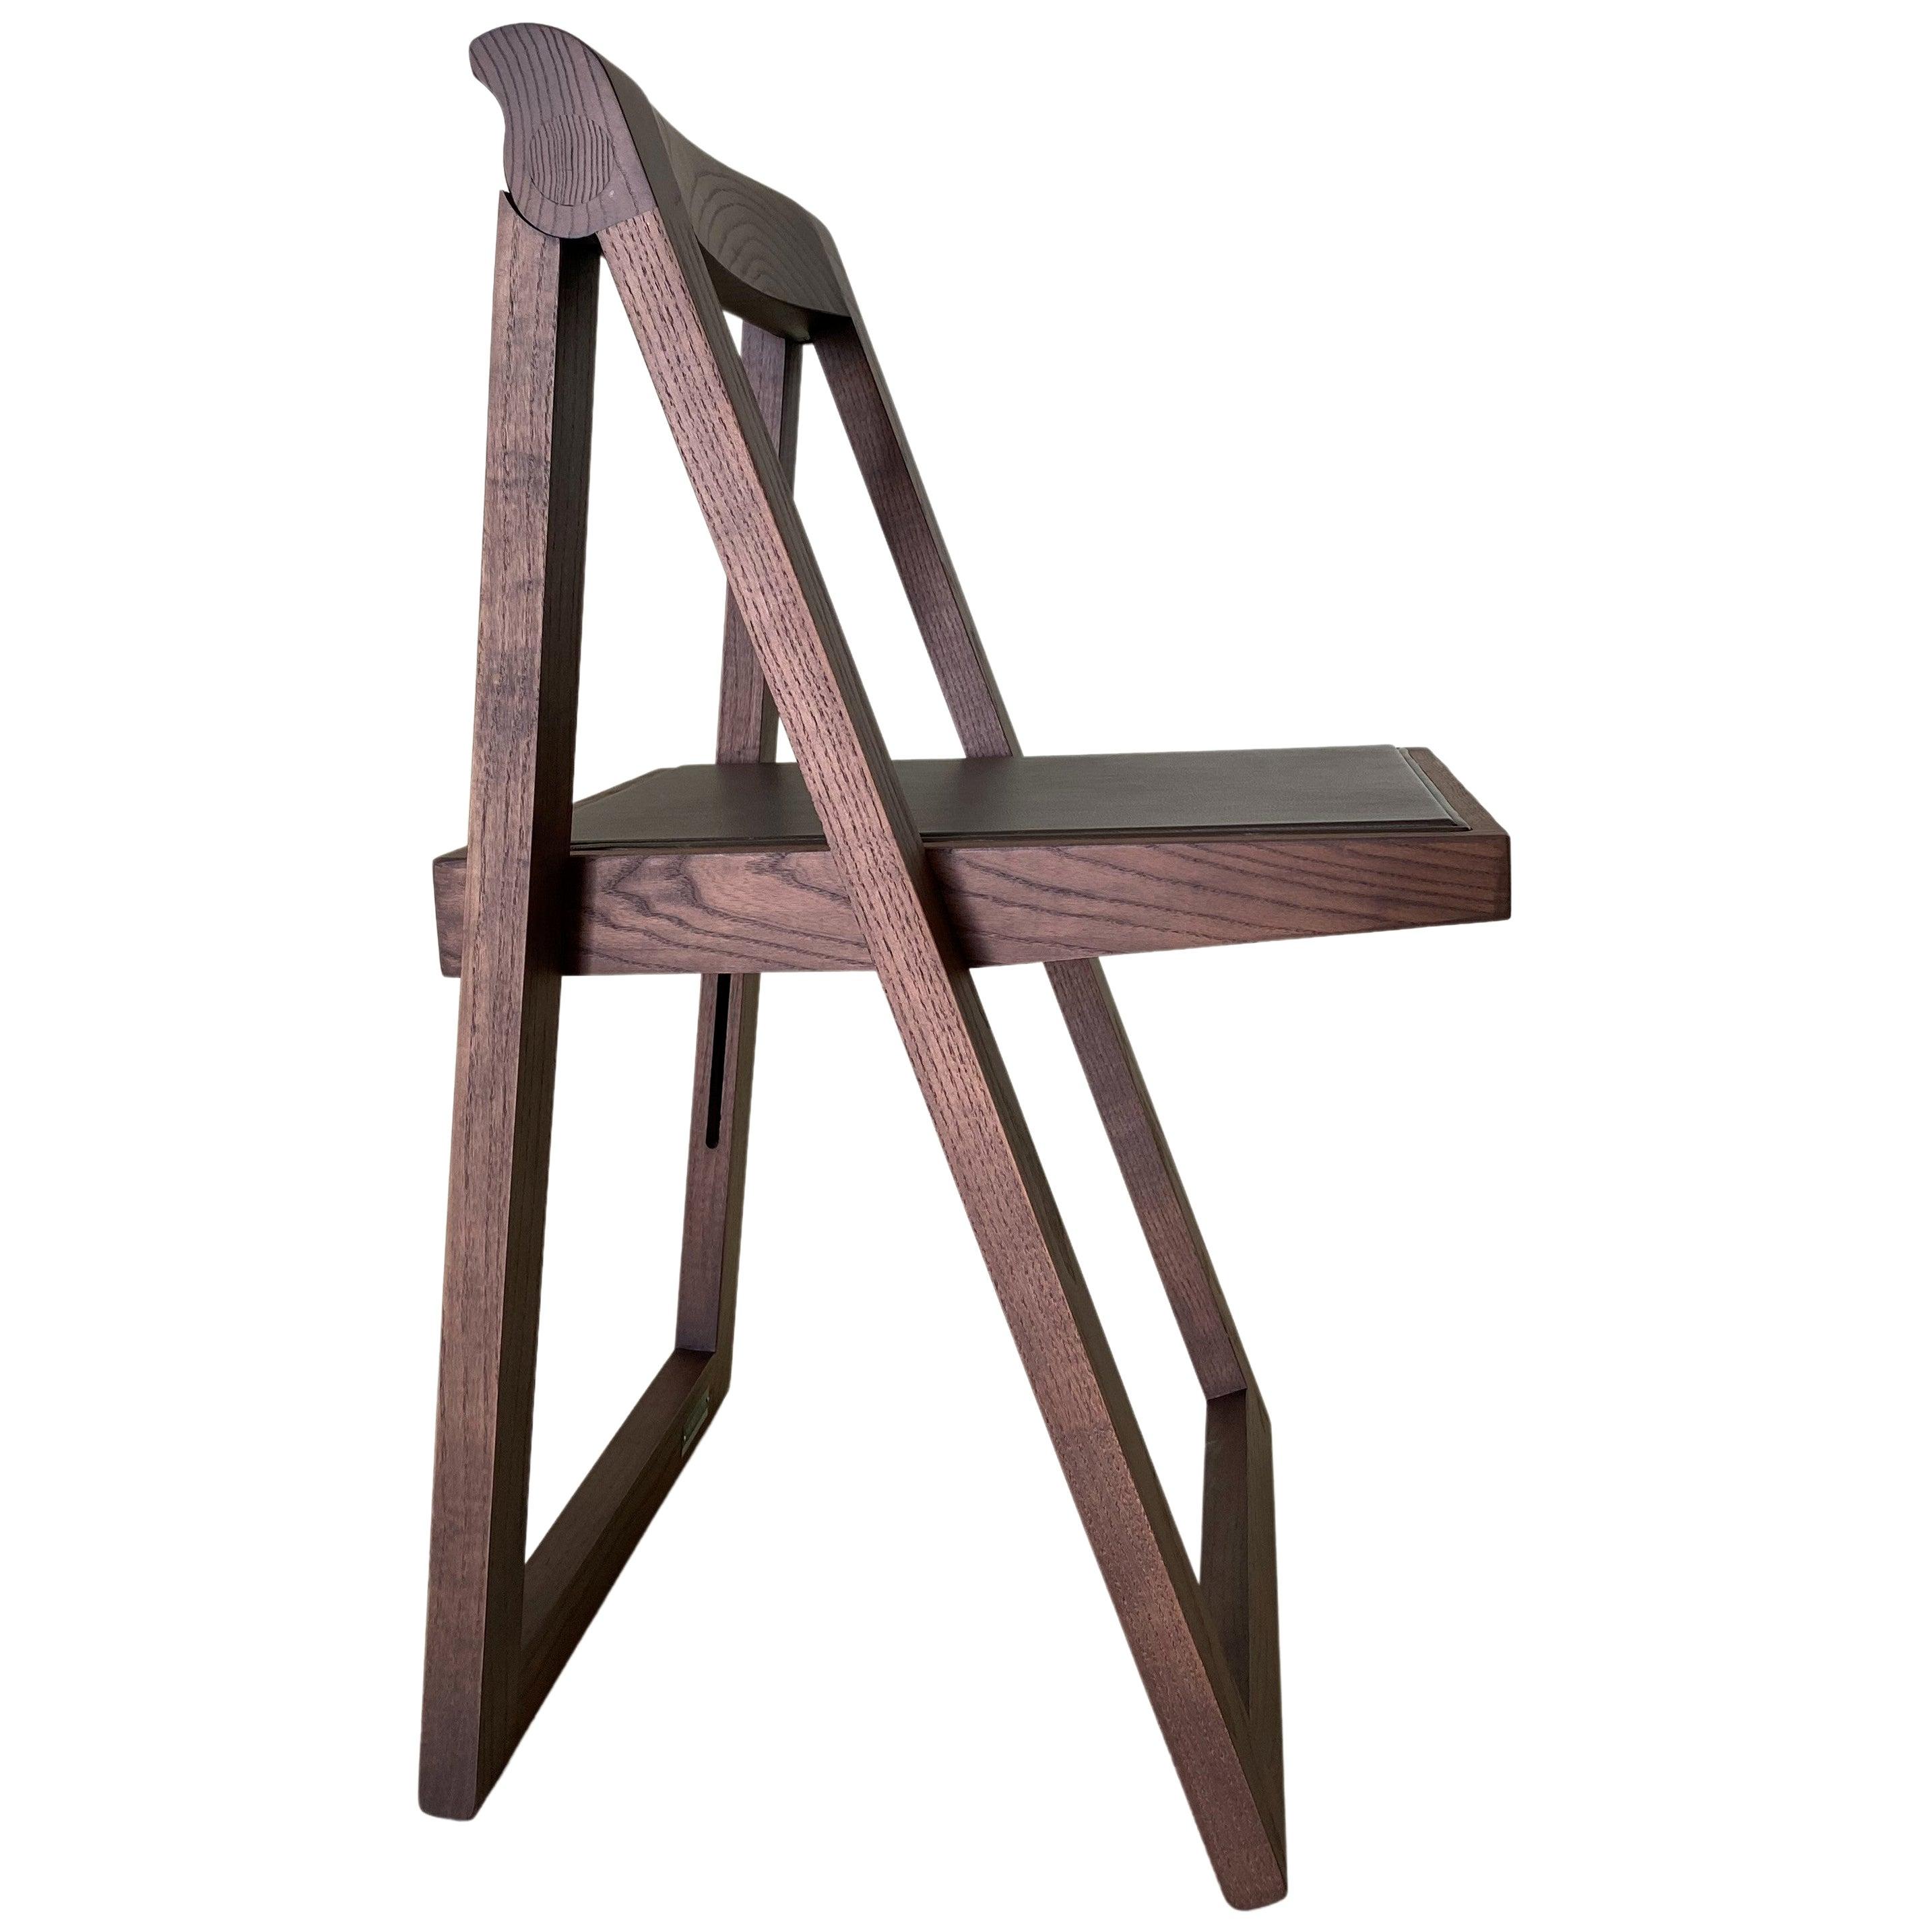 Morelato, Ciak folding Chair in Ash Wood